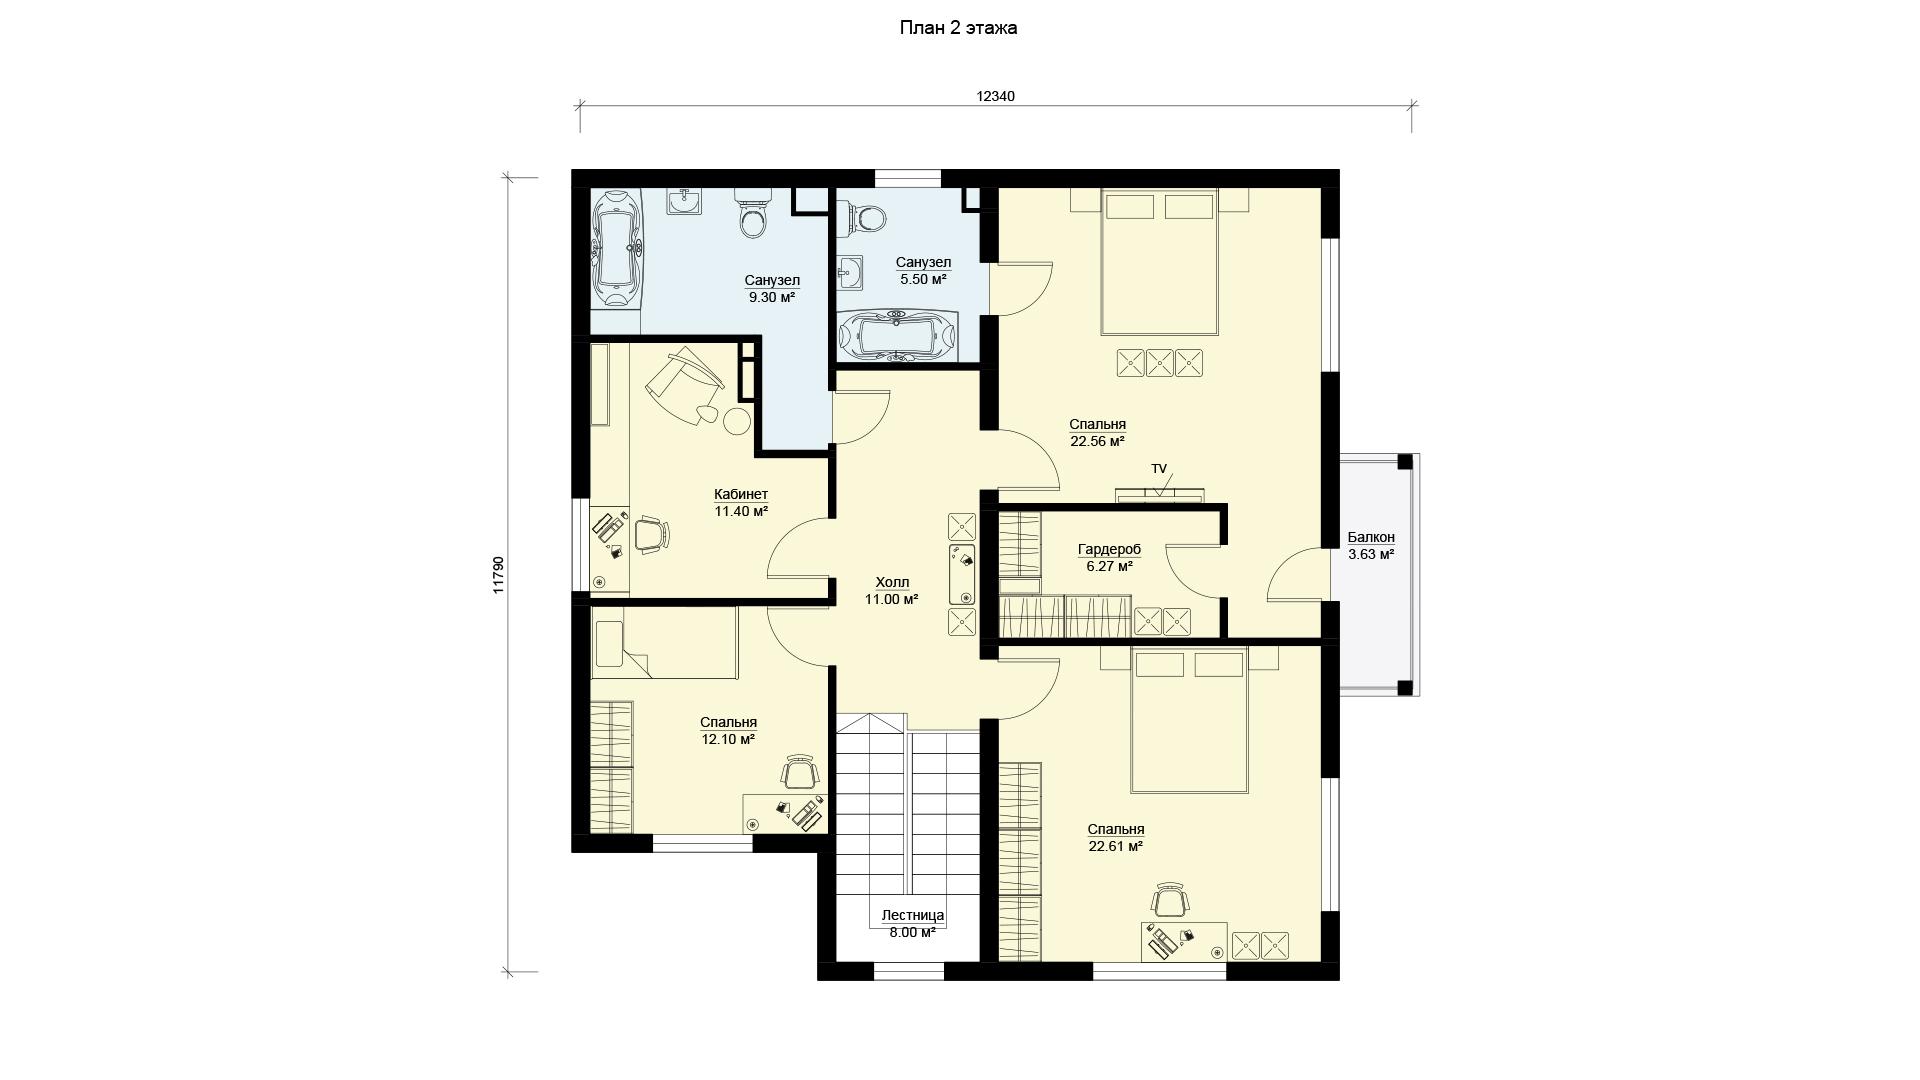 План второго этажа загородного дома 12 на 12 двухэтажного, проект БЭНПАН МС-245.